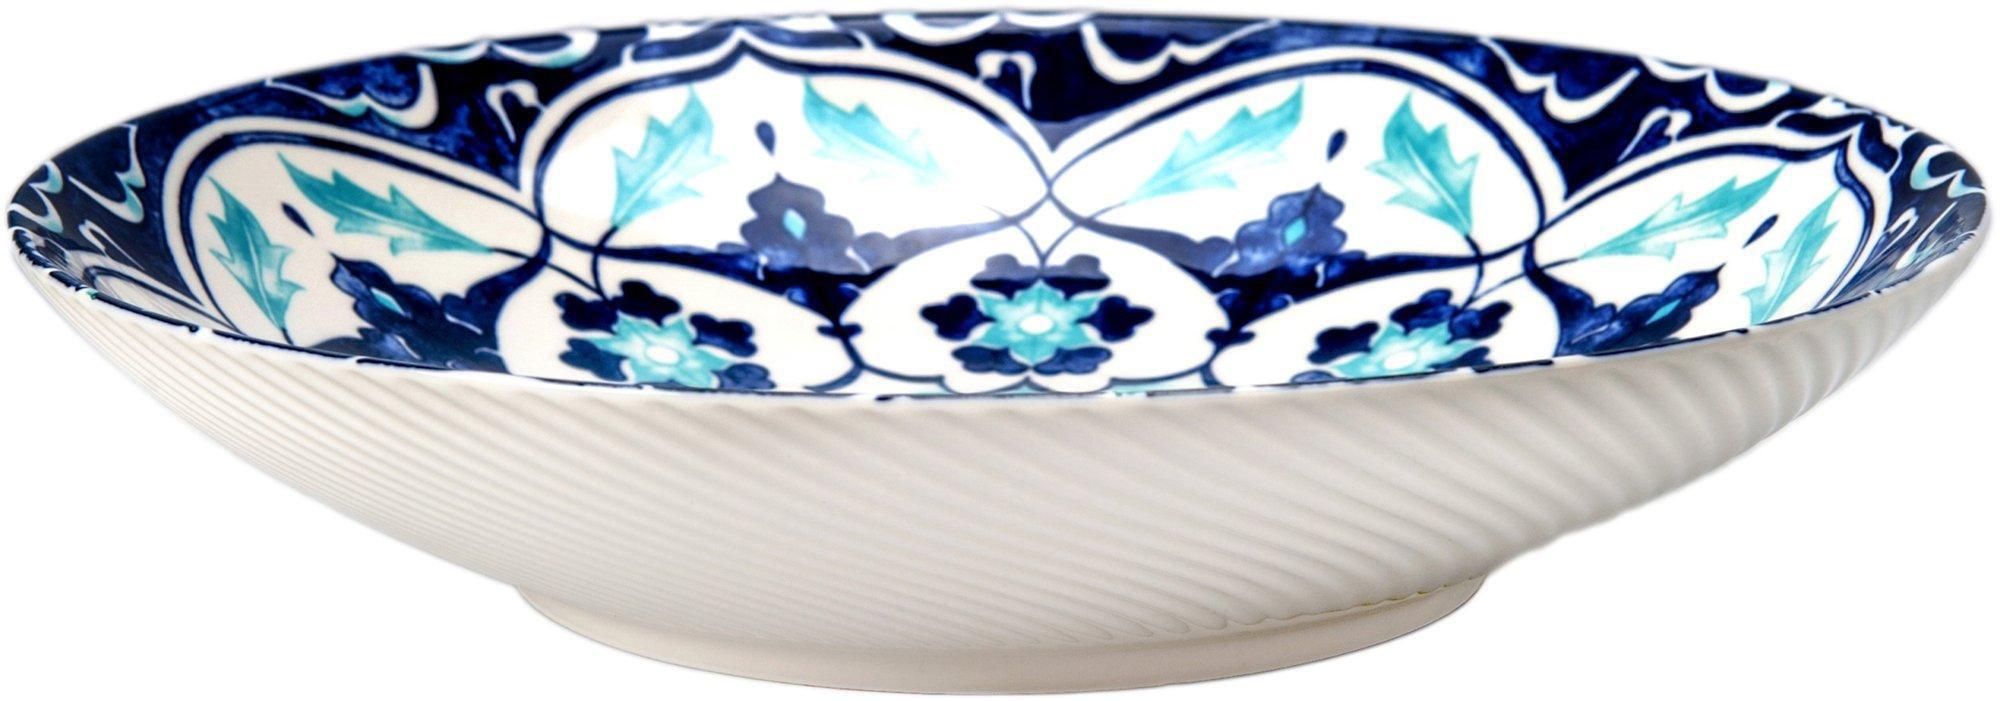 BIA Cordon Bleu Inc Isabel Pasta Bowl One Size Blue//white